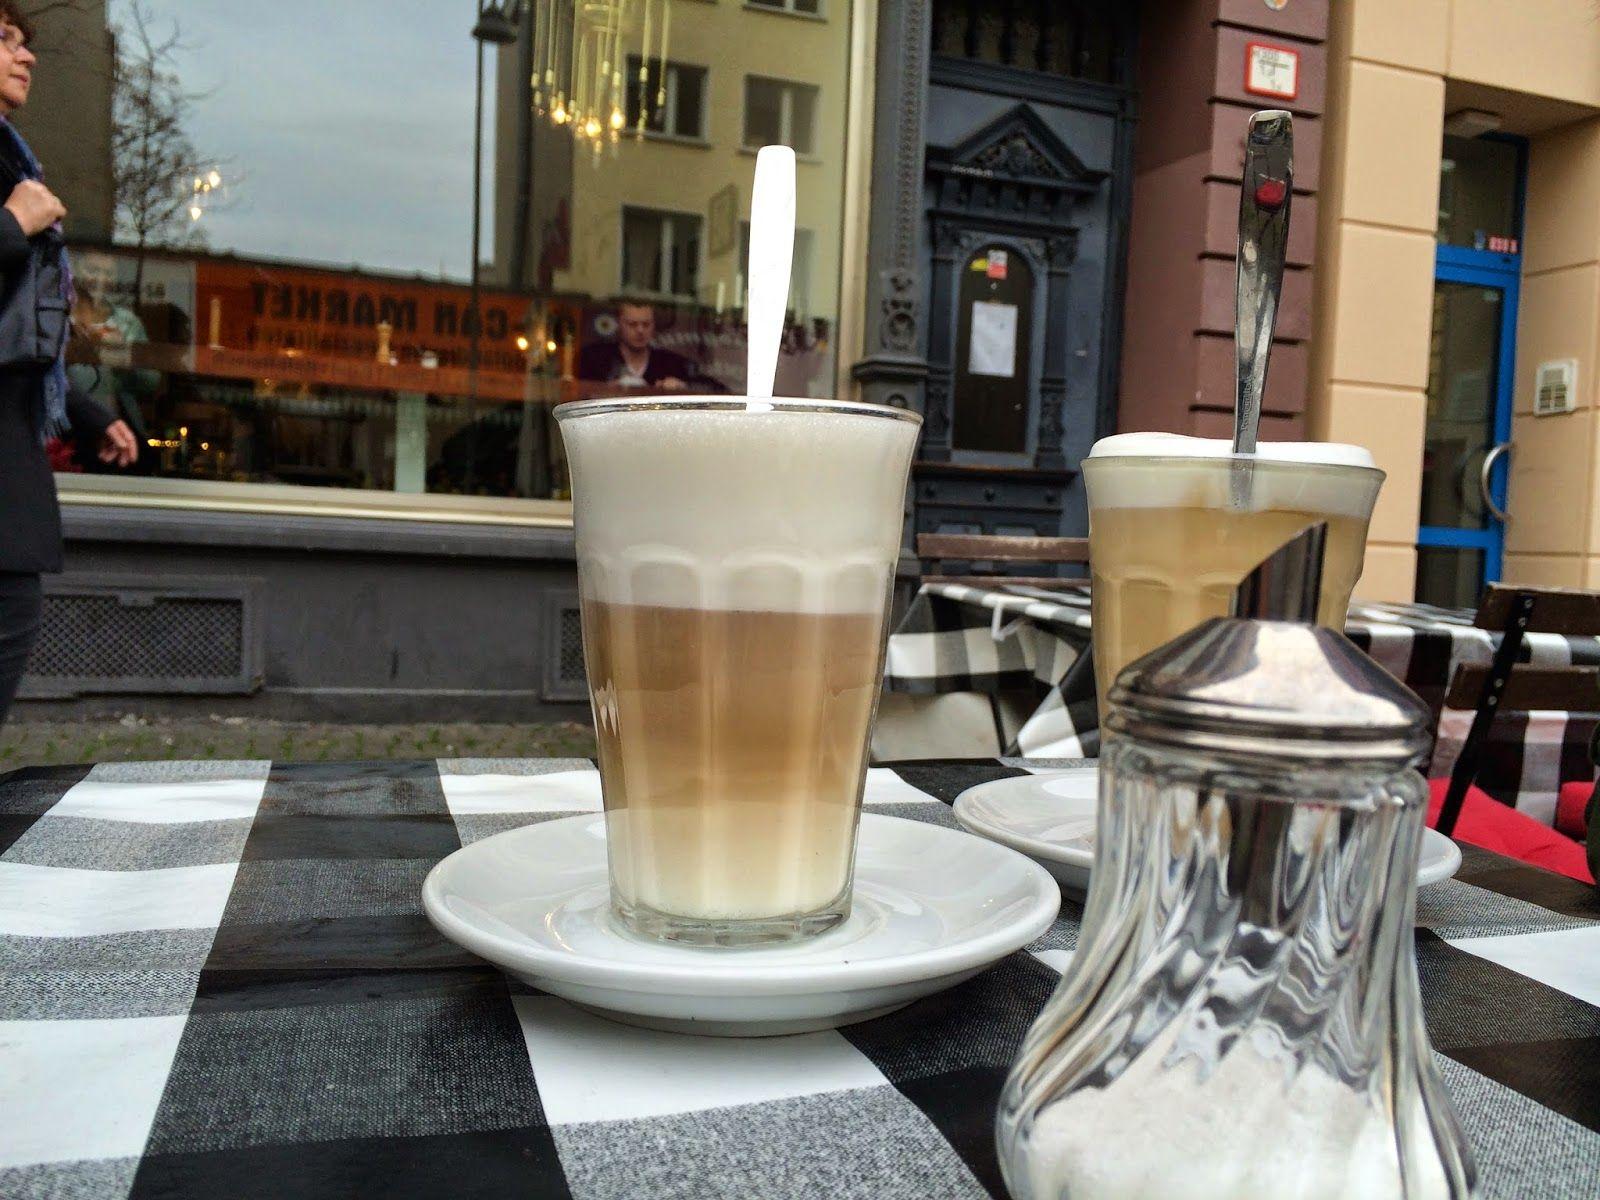 Kuchenfee Cafe Schwesterherz Koln Ehrenfeld